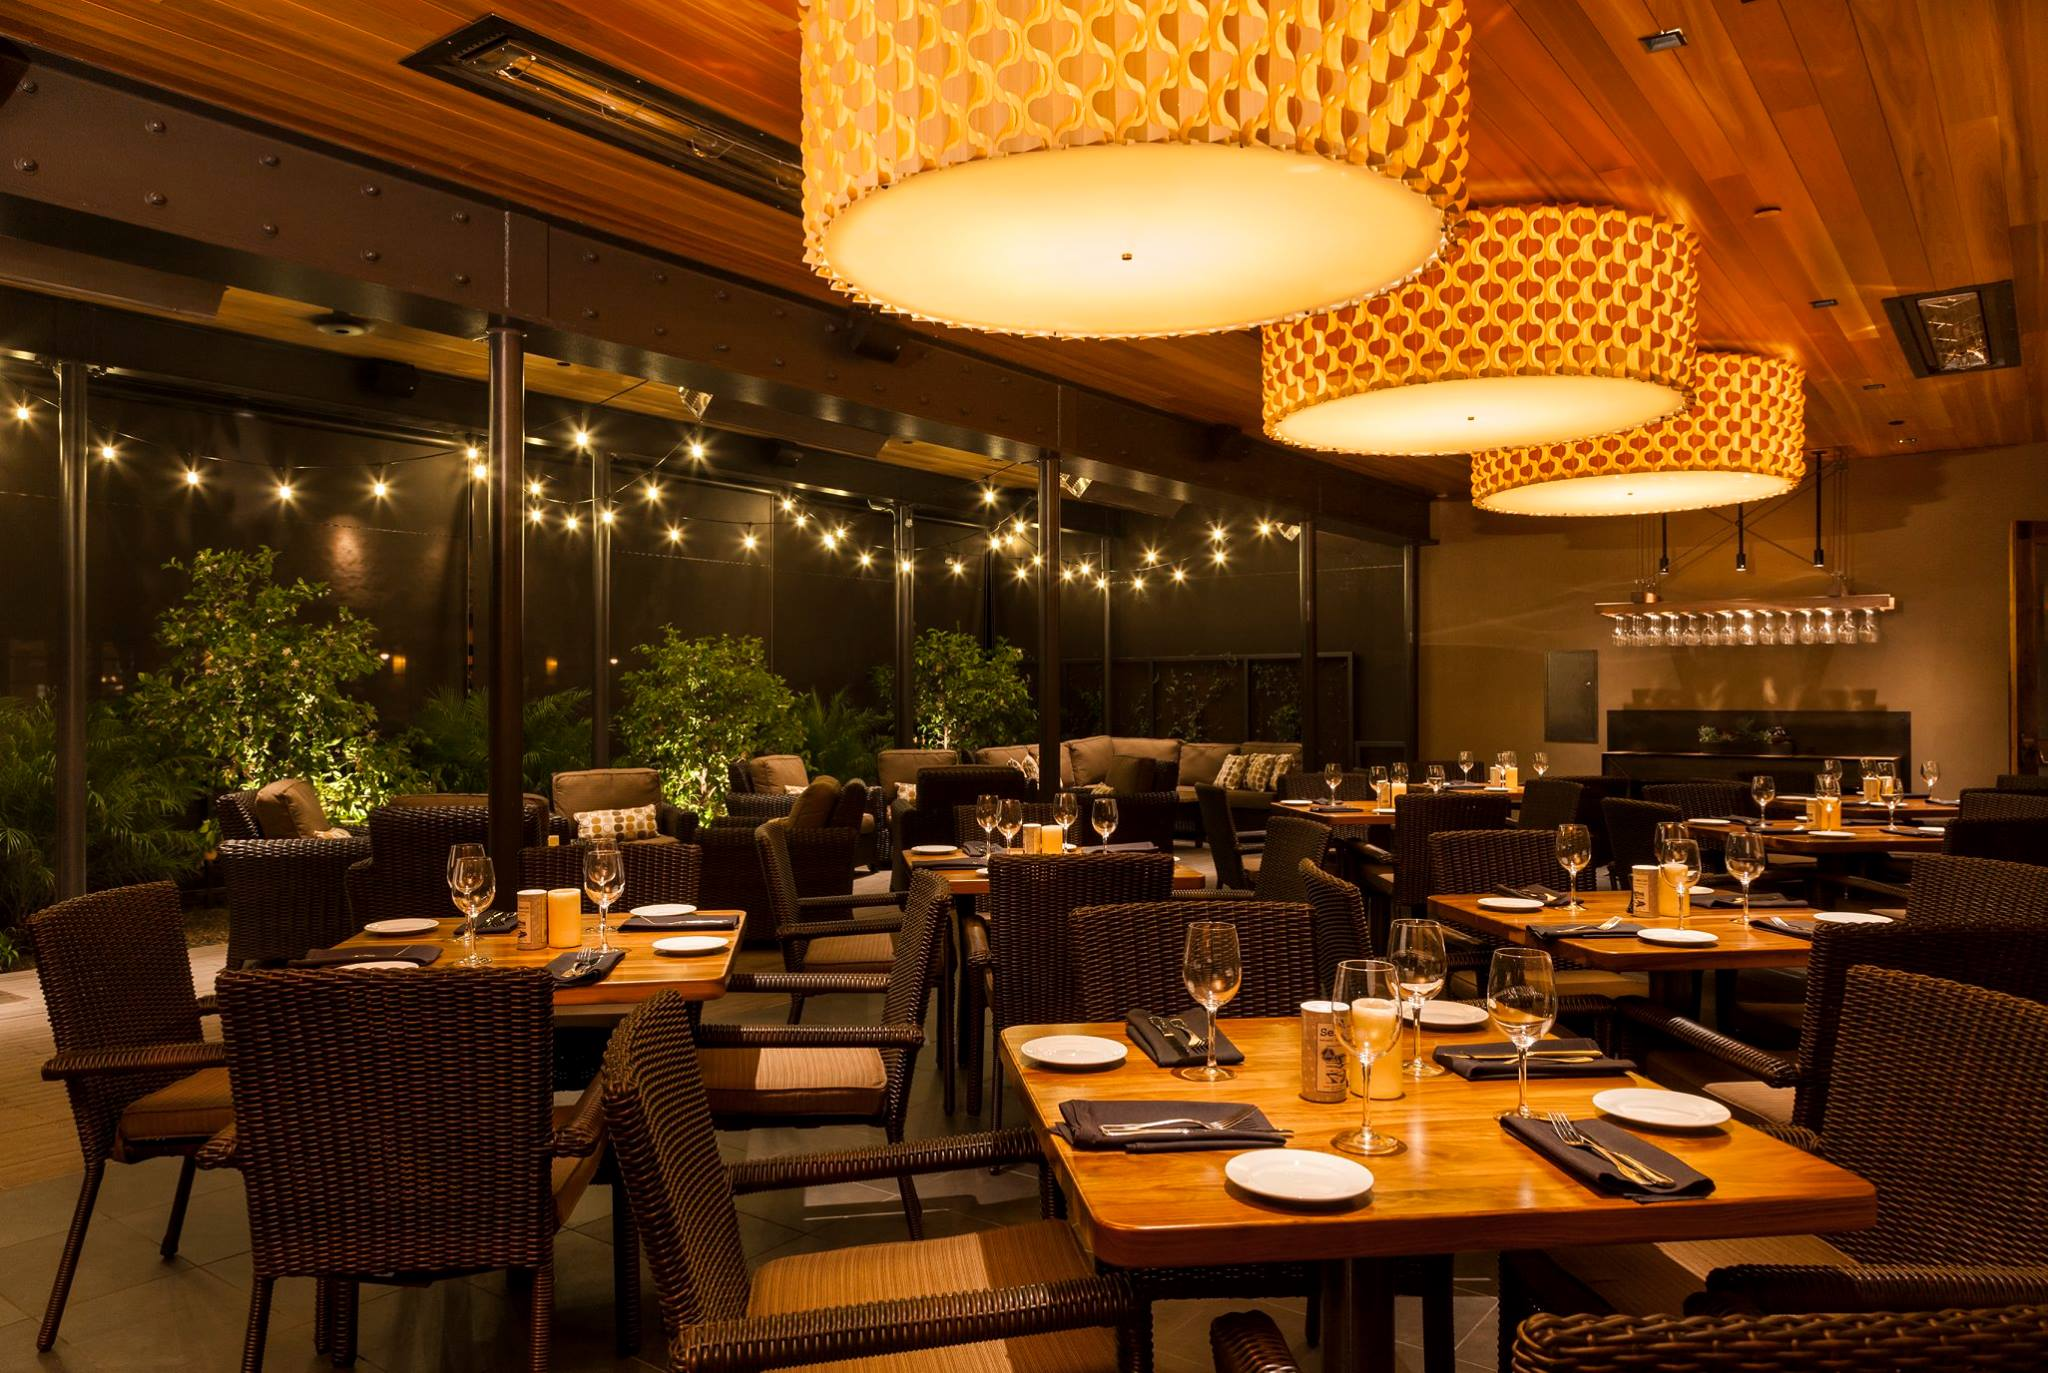 Paul Martin's American Grill in Scottsdale